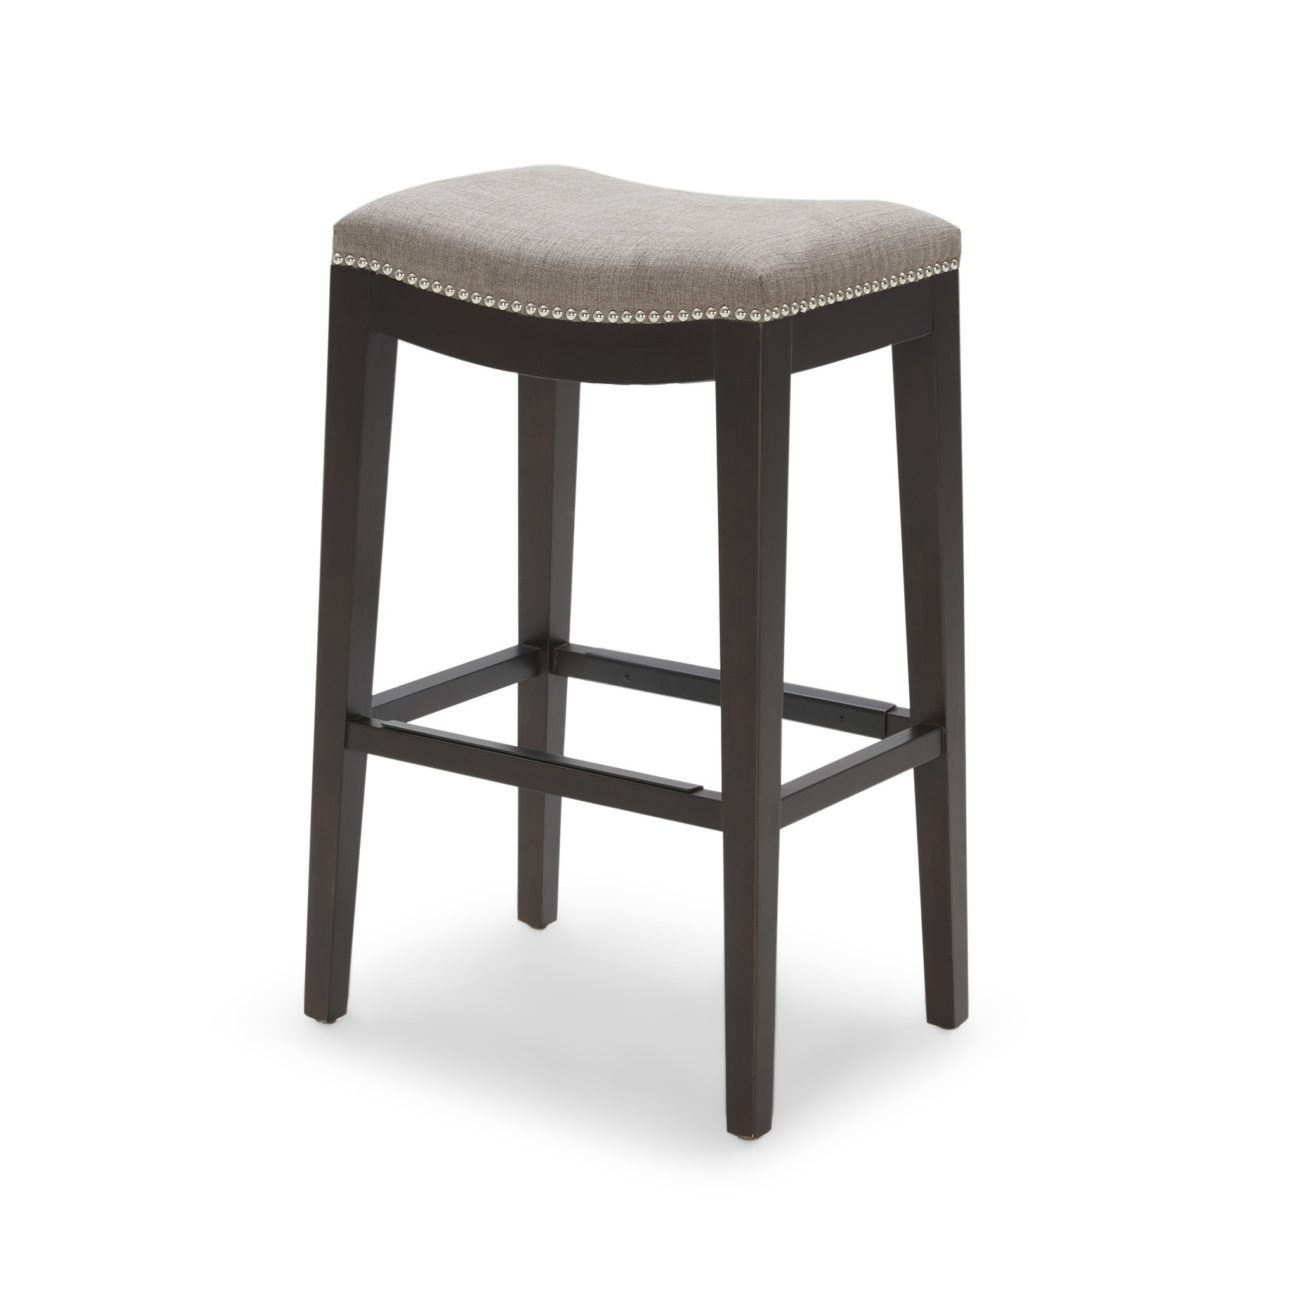 Luckenbach Barstool Horizon Home Furniture : ep36 Y1350InPixio from horizonhomefurniture.net size 1300 x 1300 jpeg 57kB